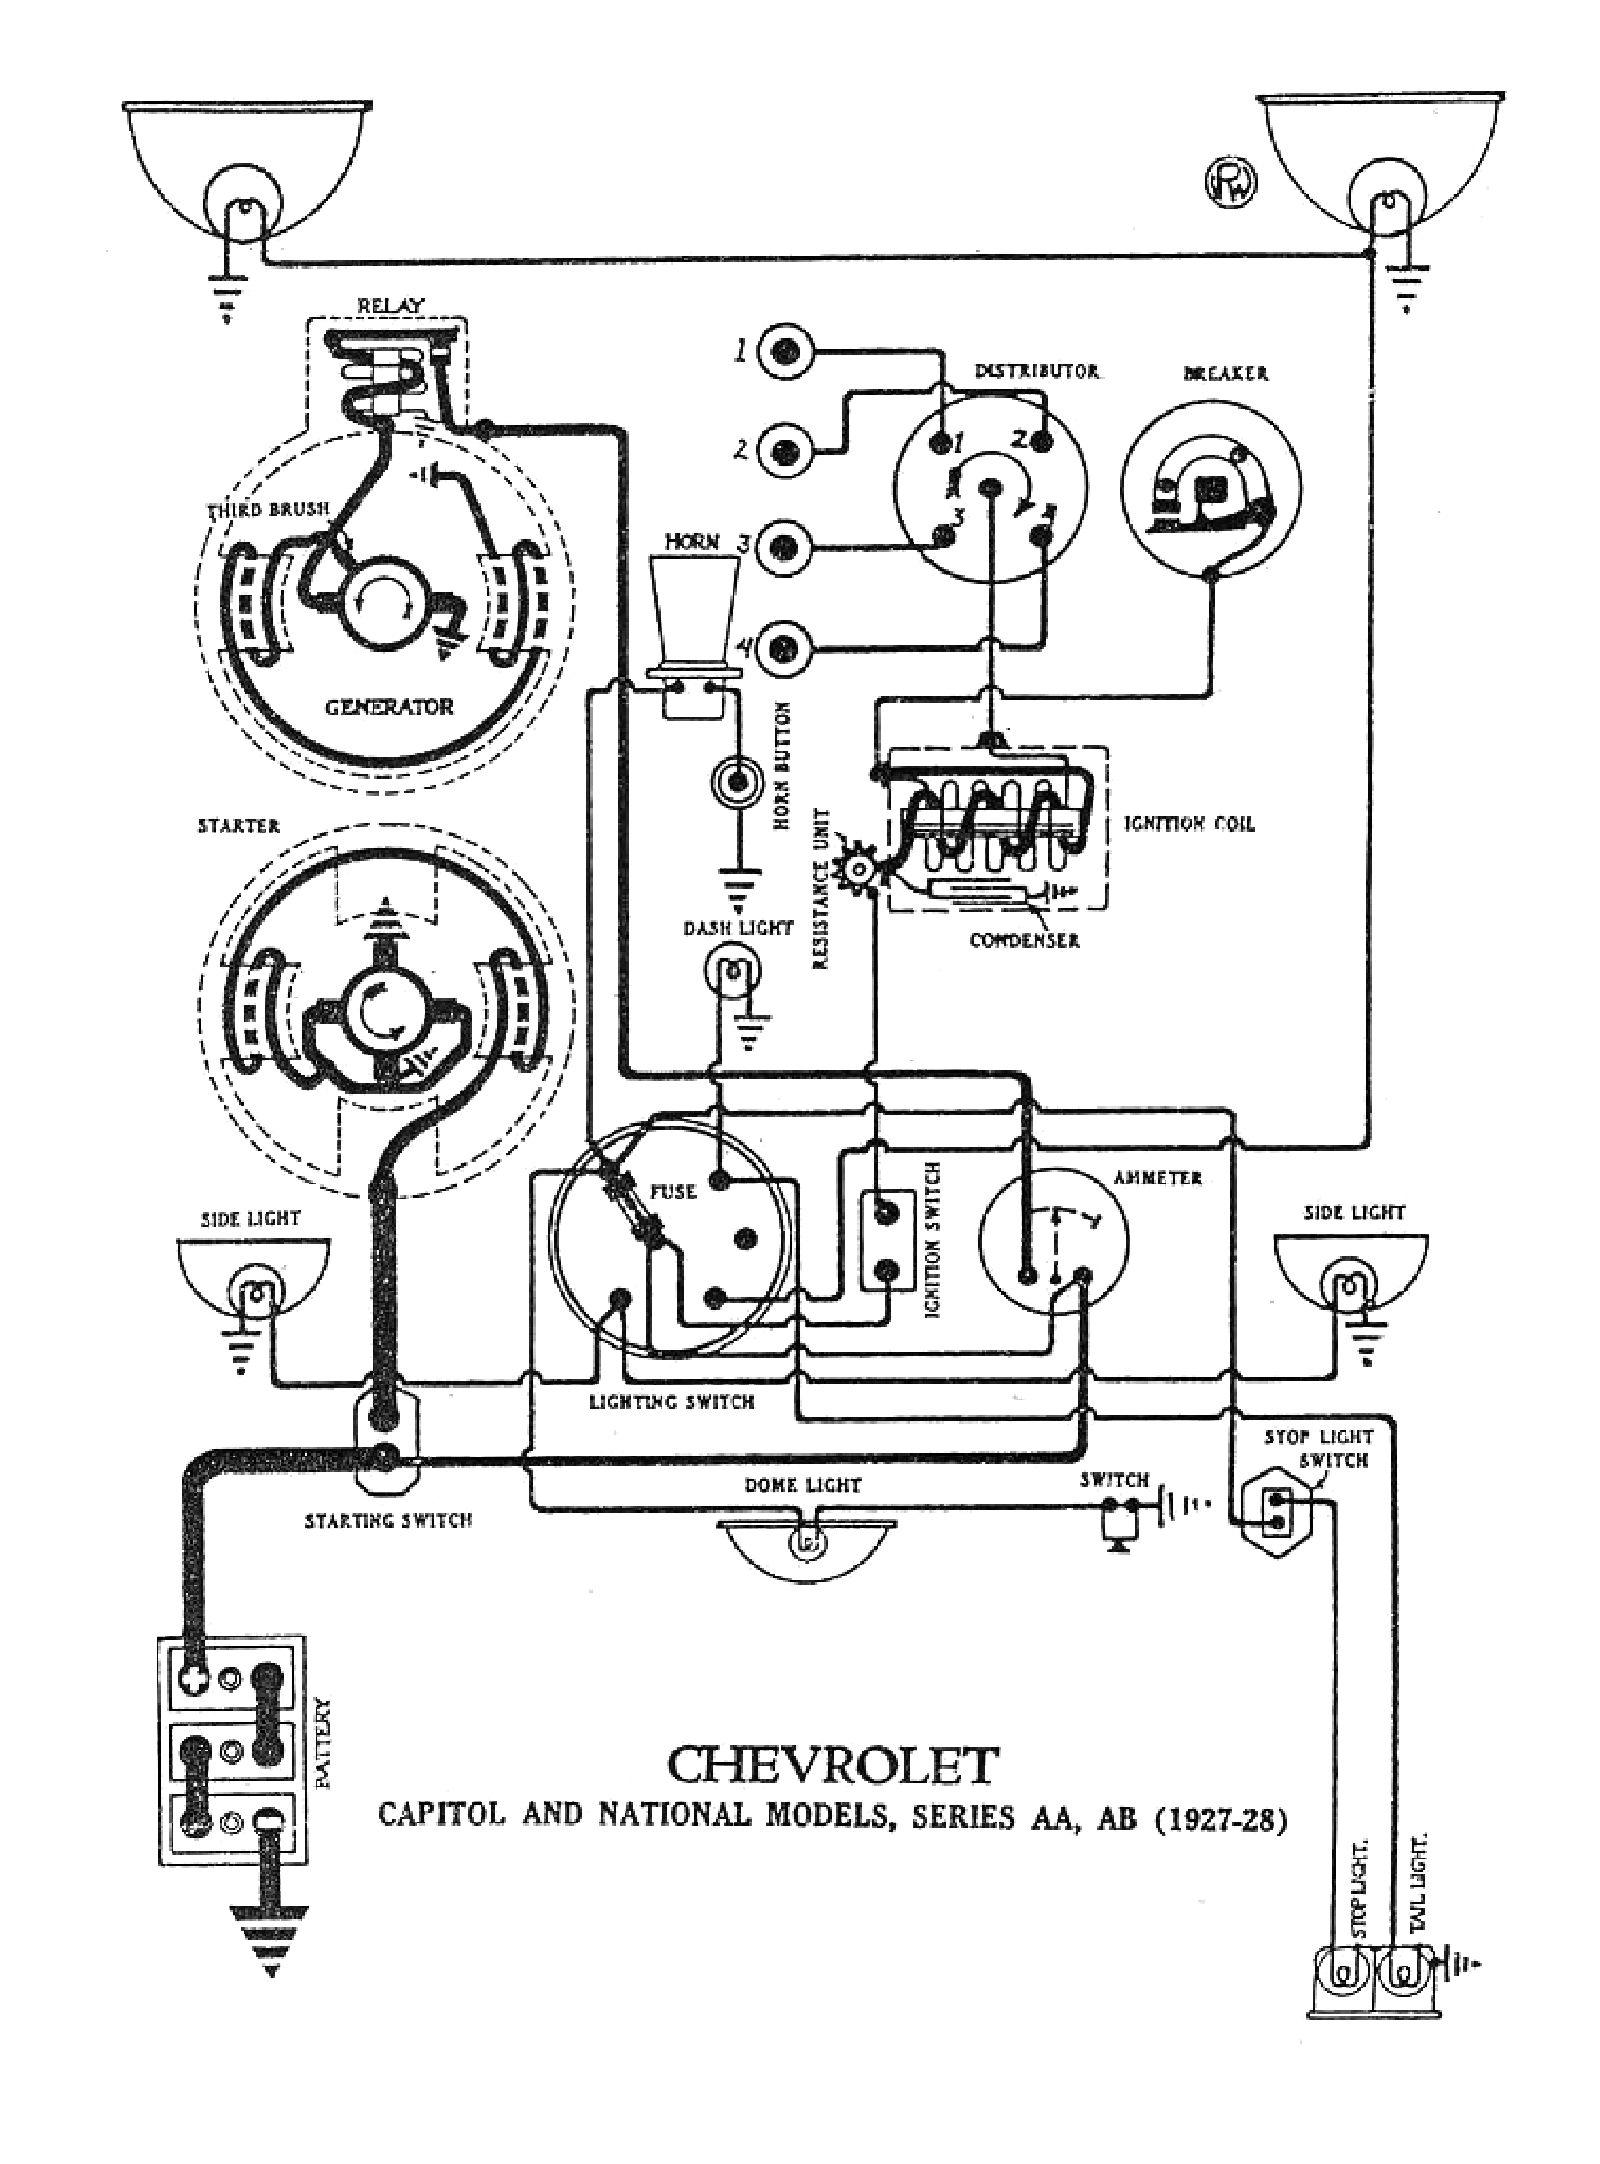 Stupendous 1930 Chevy Wiring Wiring Library Wiring Cloud Domeilariaidewilluminateatxorg